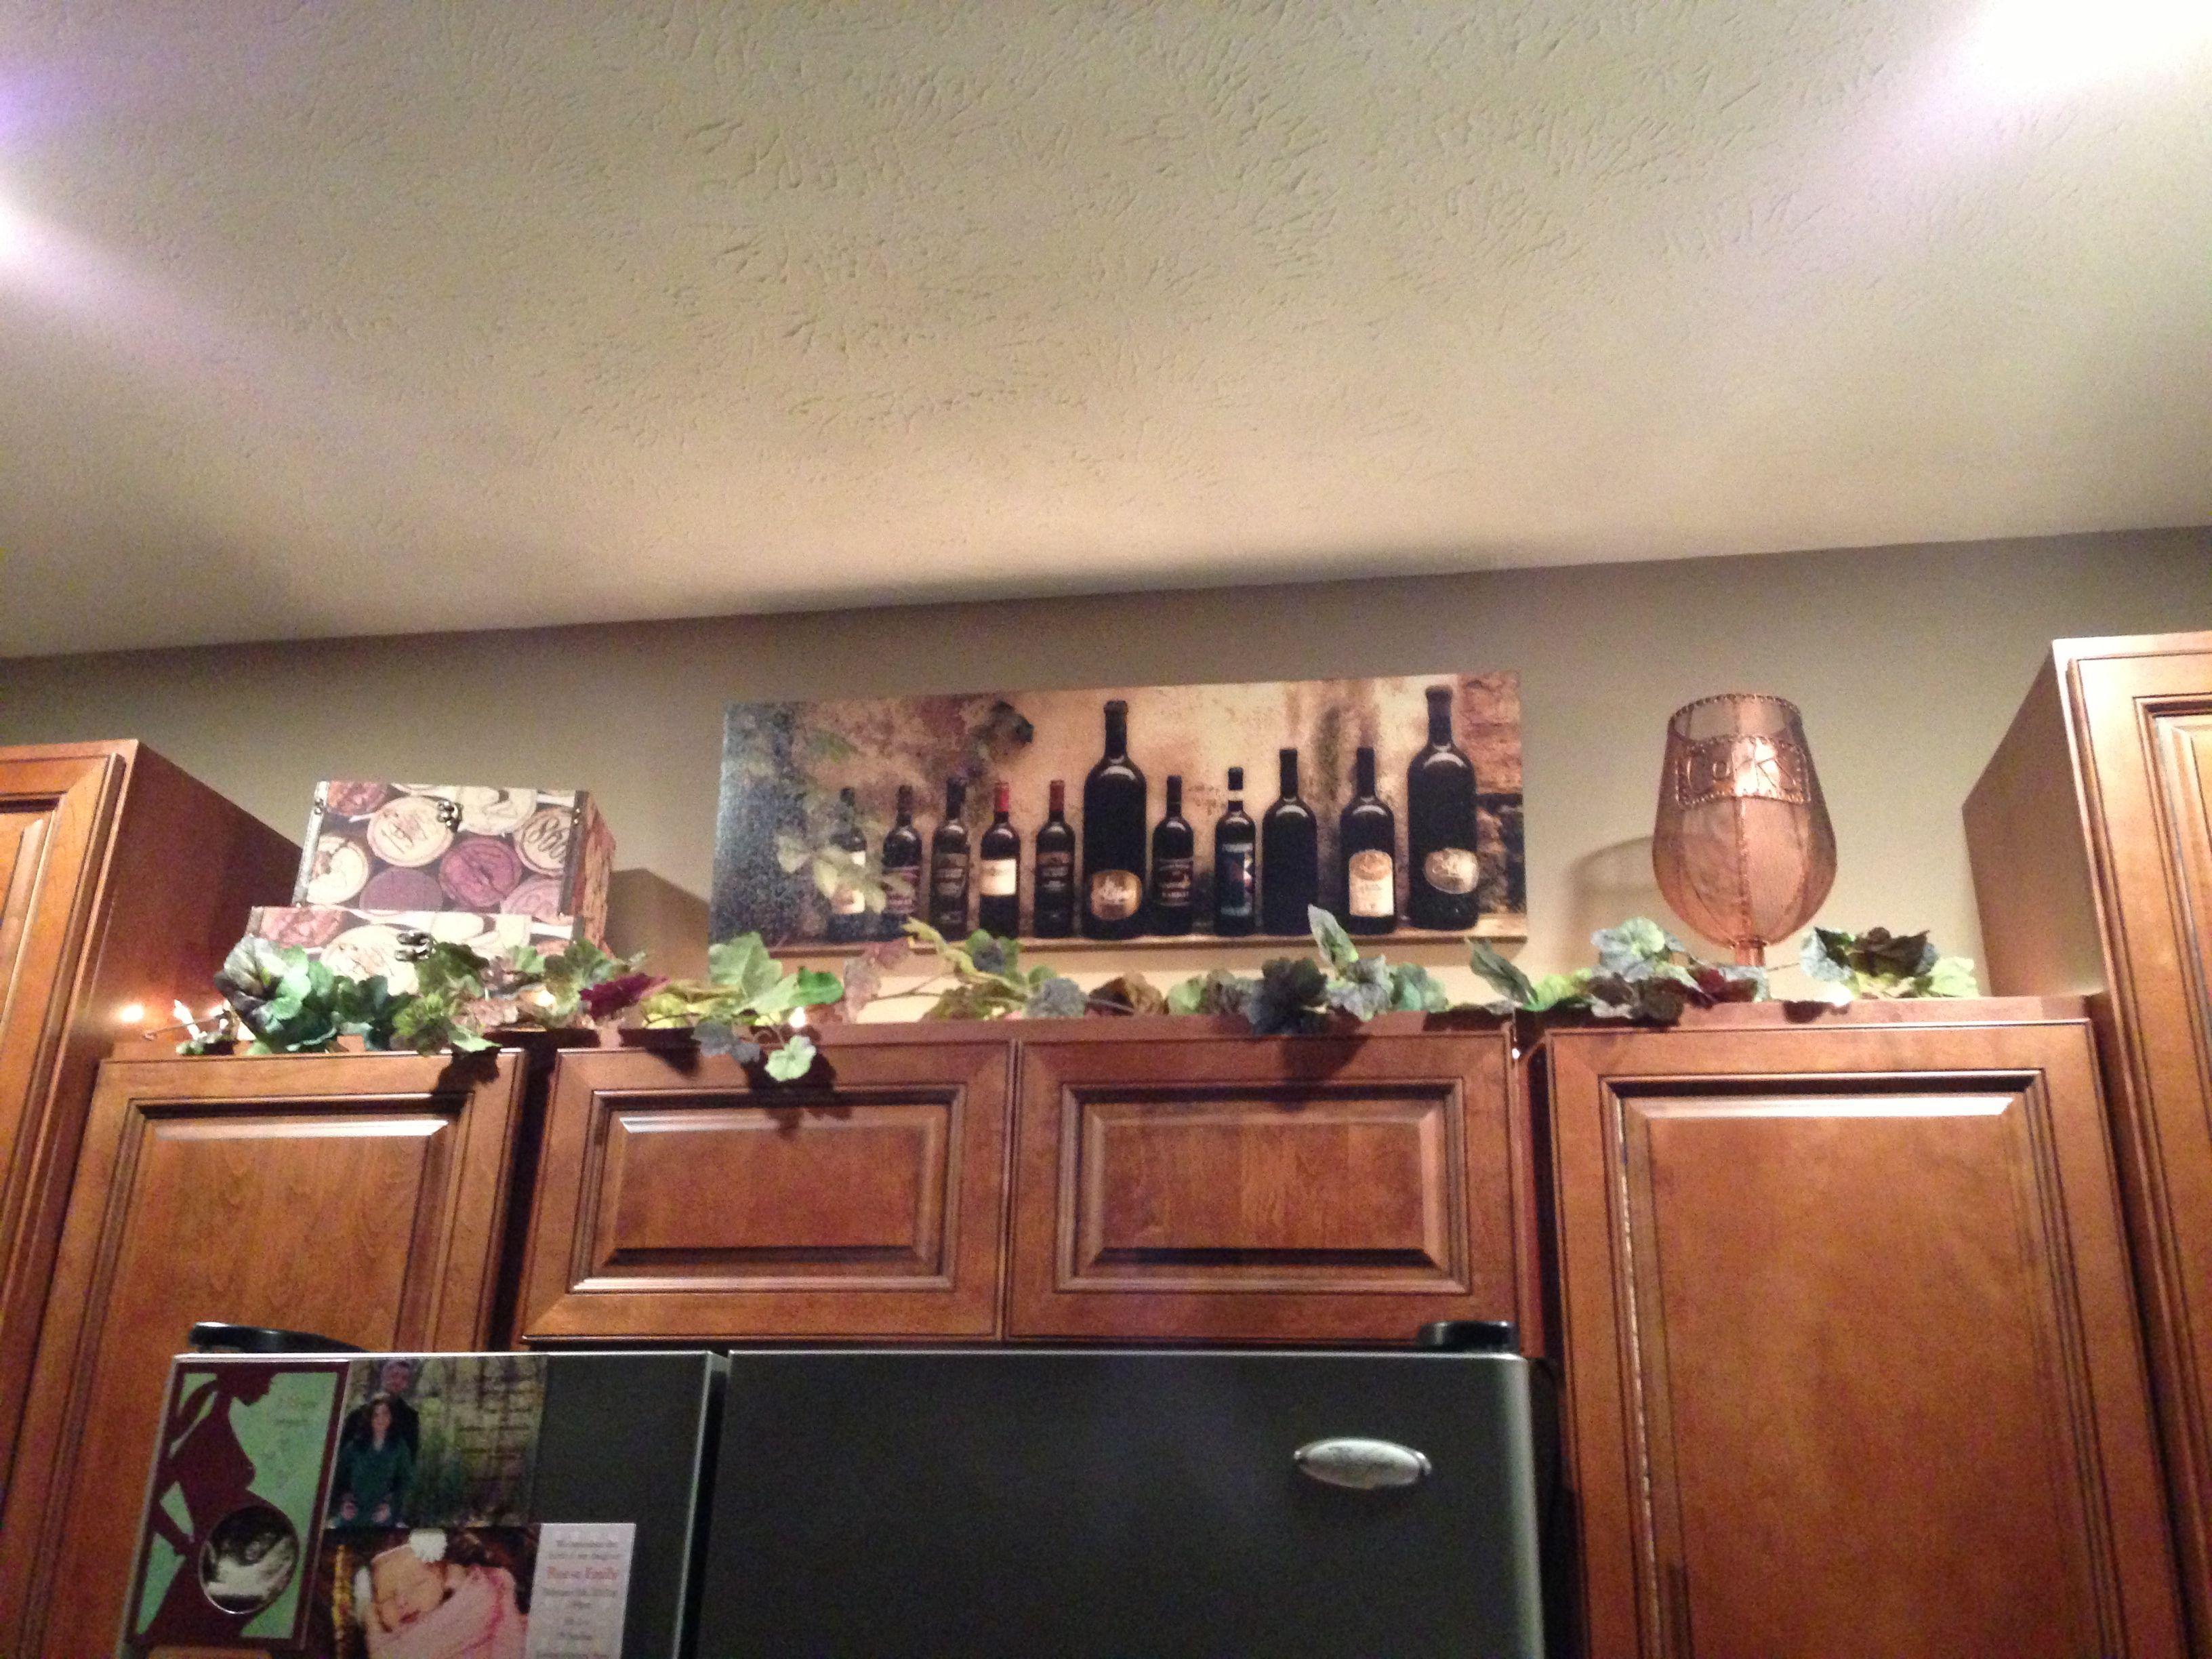 wine kitchen cabinet decorations home decor ideas pinterest on kitchen ideas decoration themes id=44757